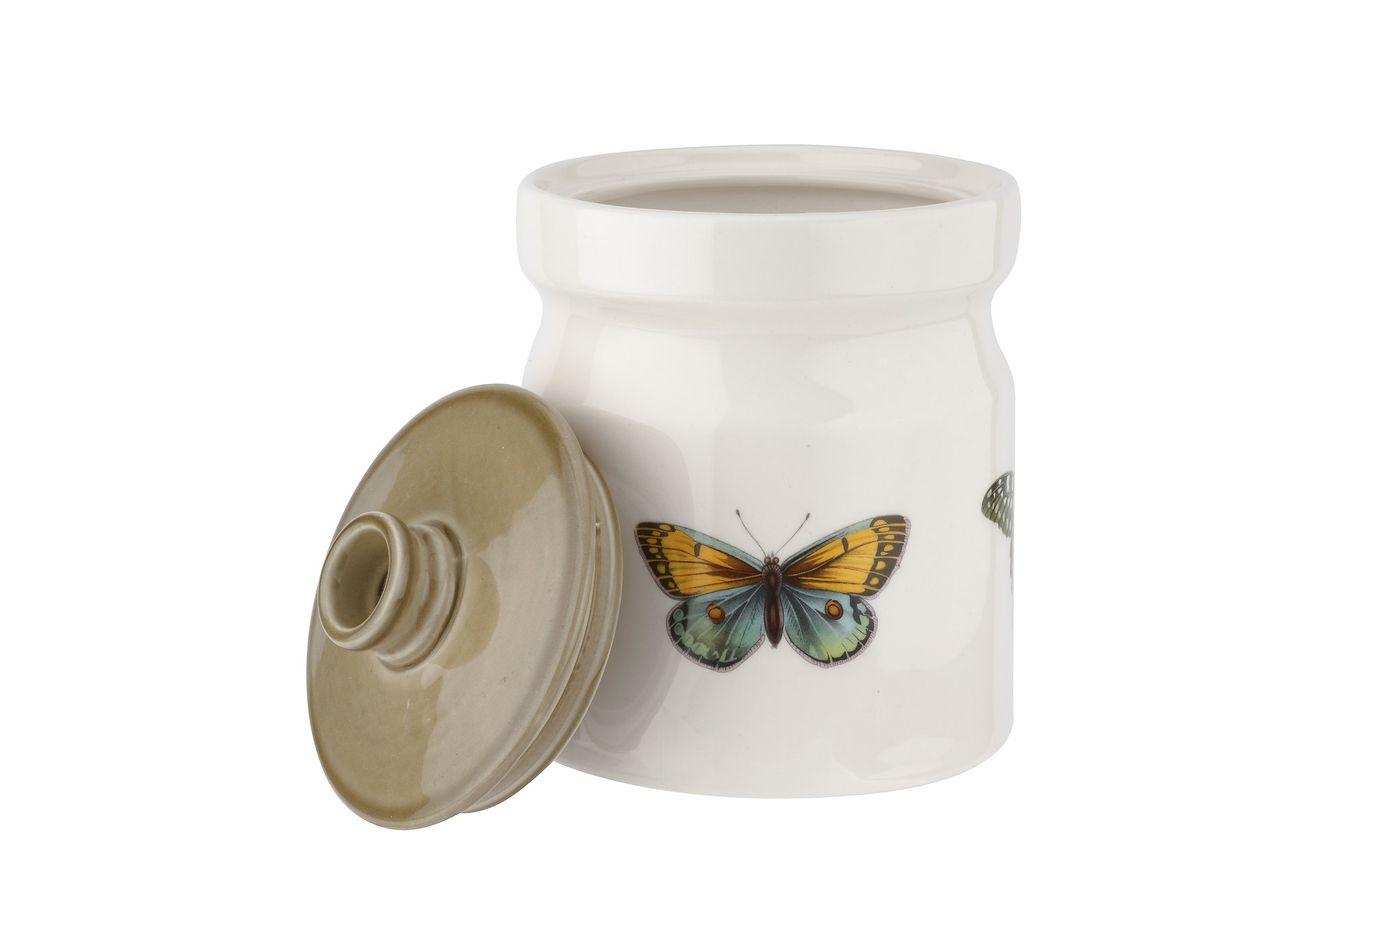 Portmeirion Botanic Garden Harmony Storage Jar + Lid 14cm thumb 3